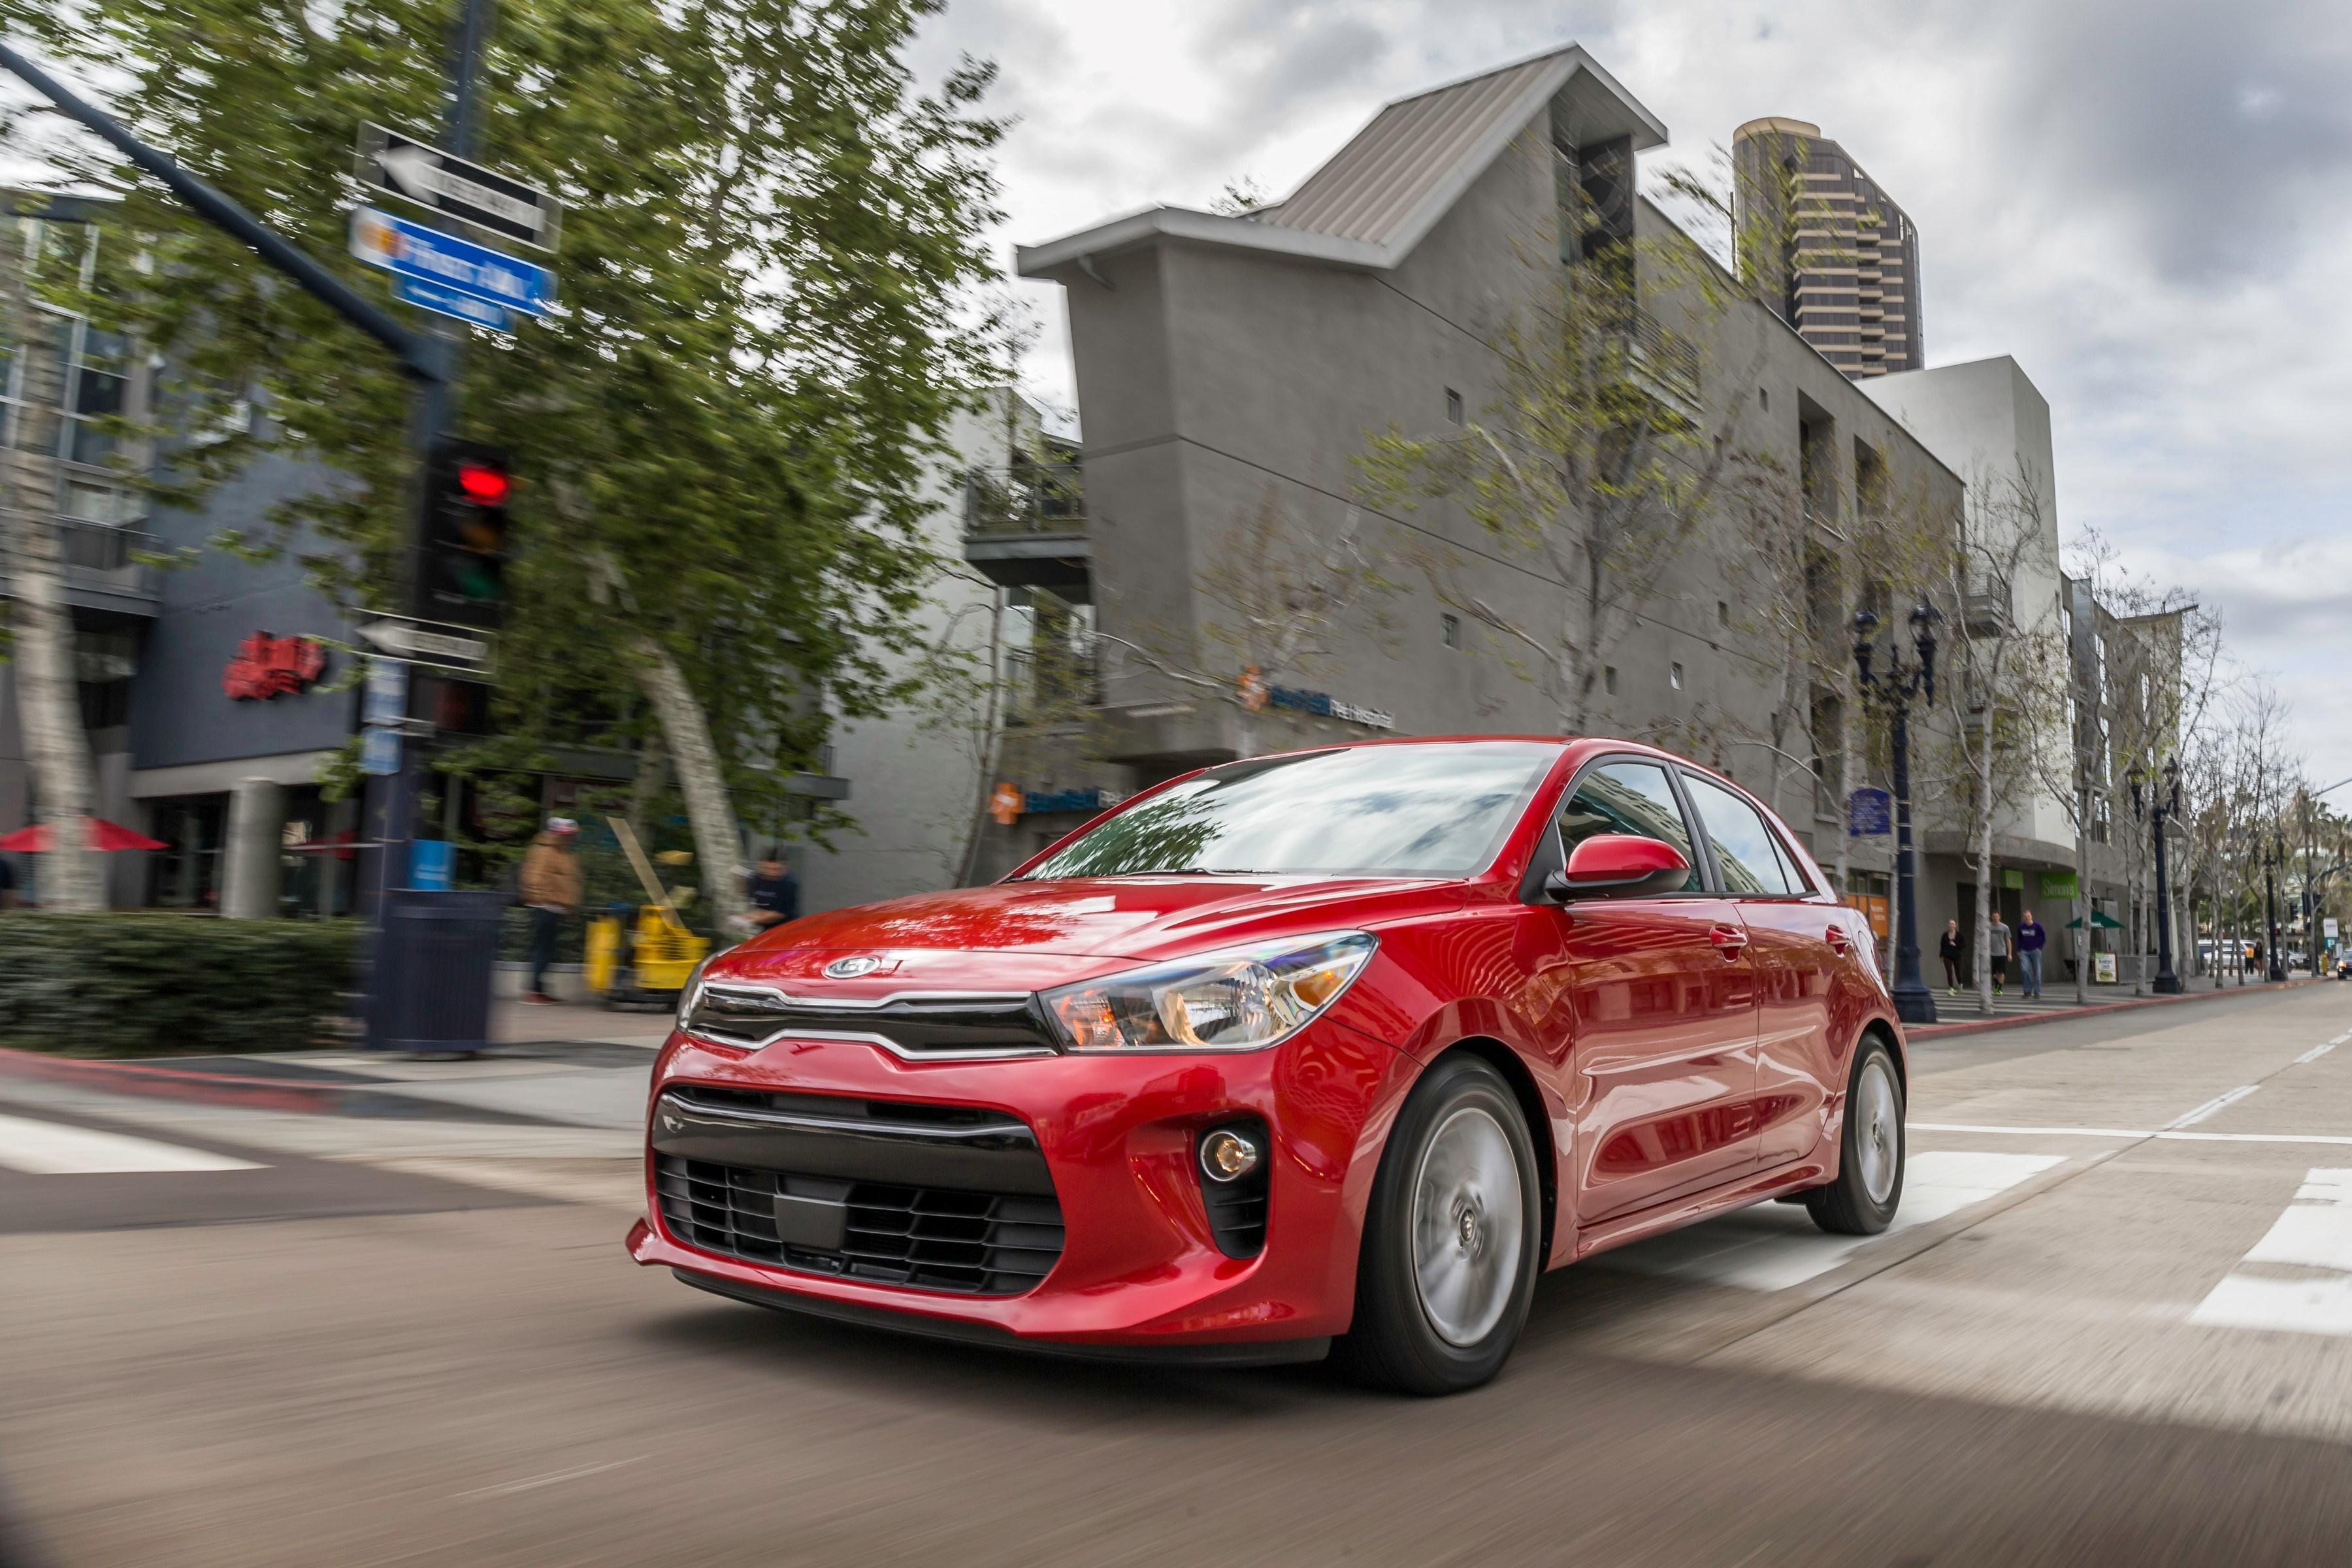 Kia Rio Loses Manual Transmission In The Us on Kia Rio Price